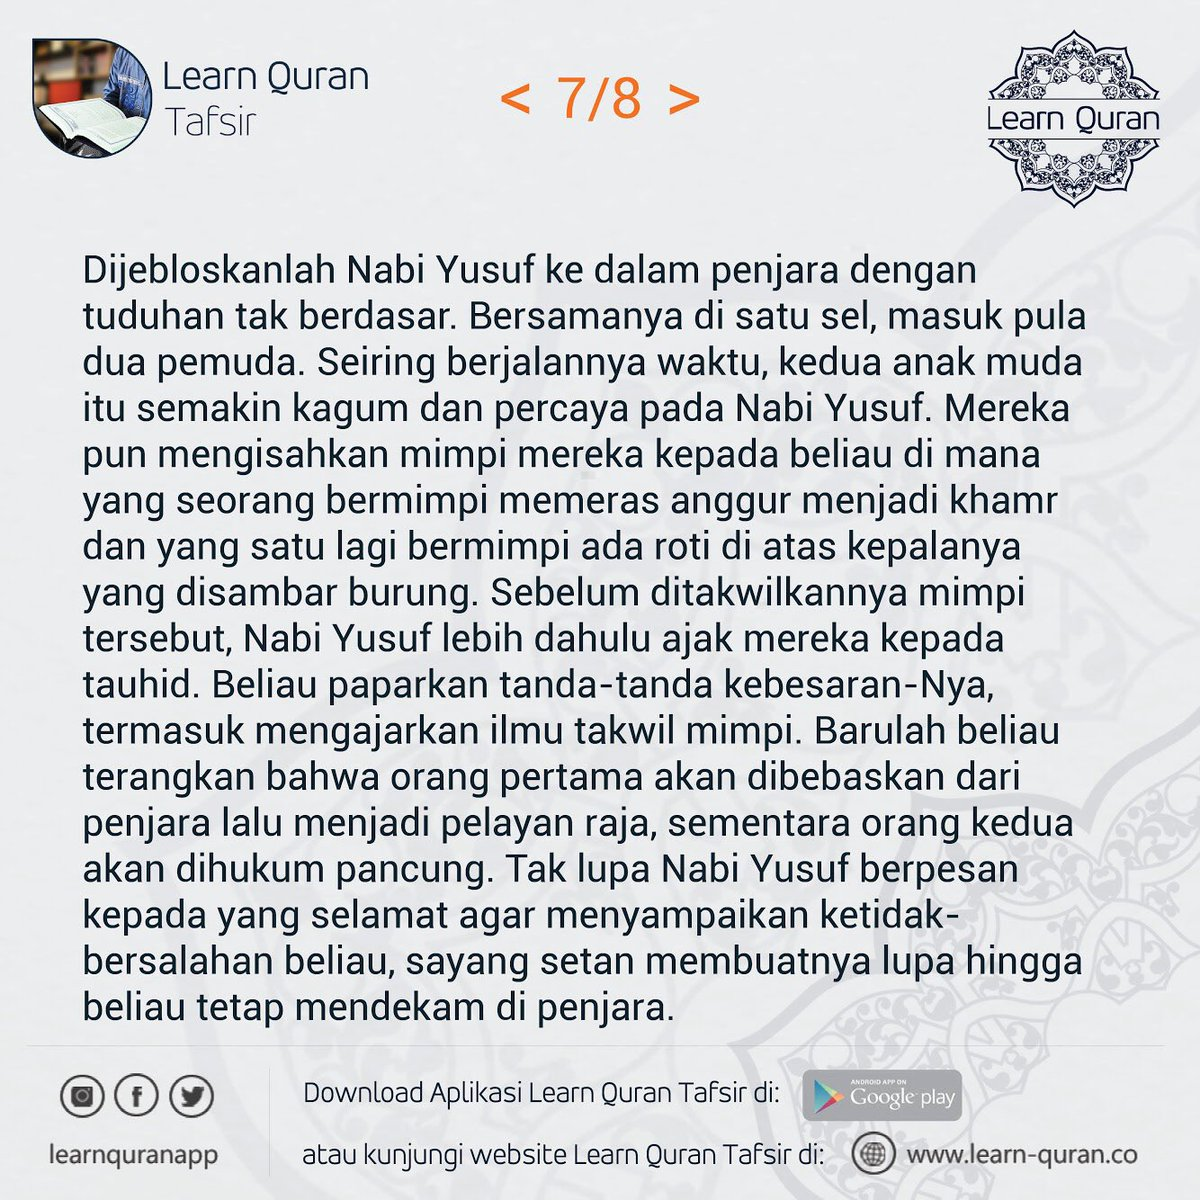 Tweet added by Learn Quran - Download Photos | Twipu